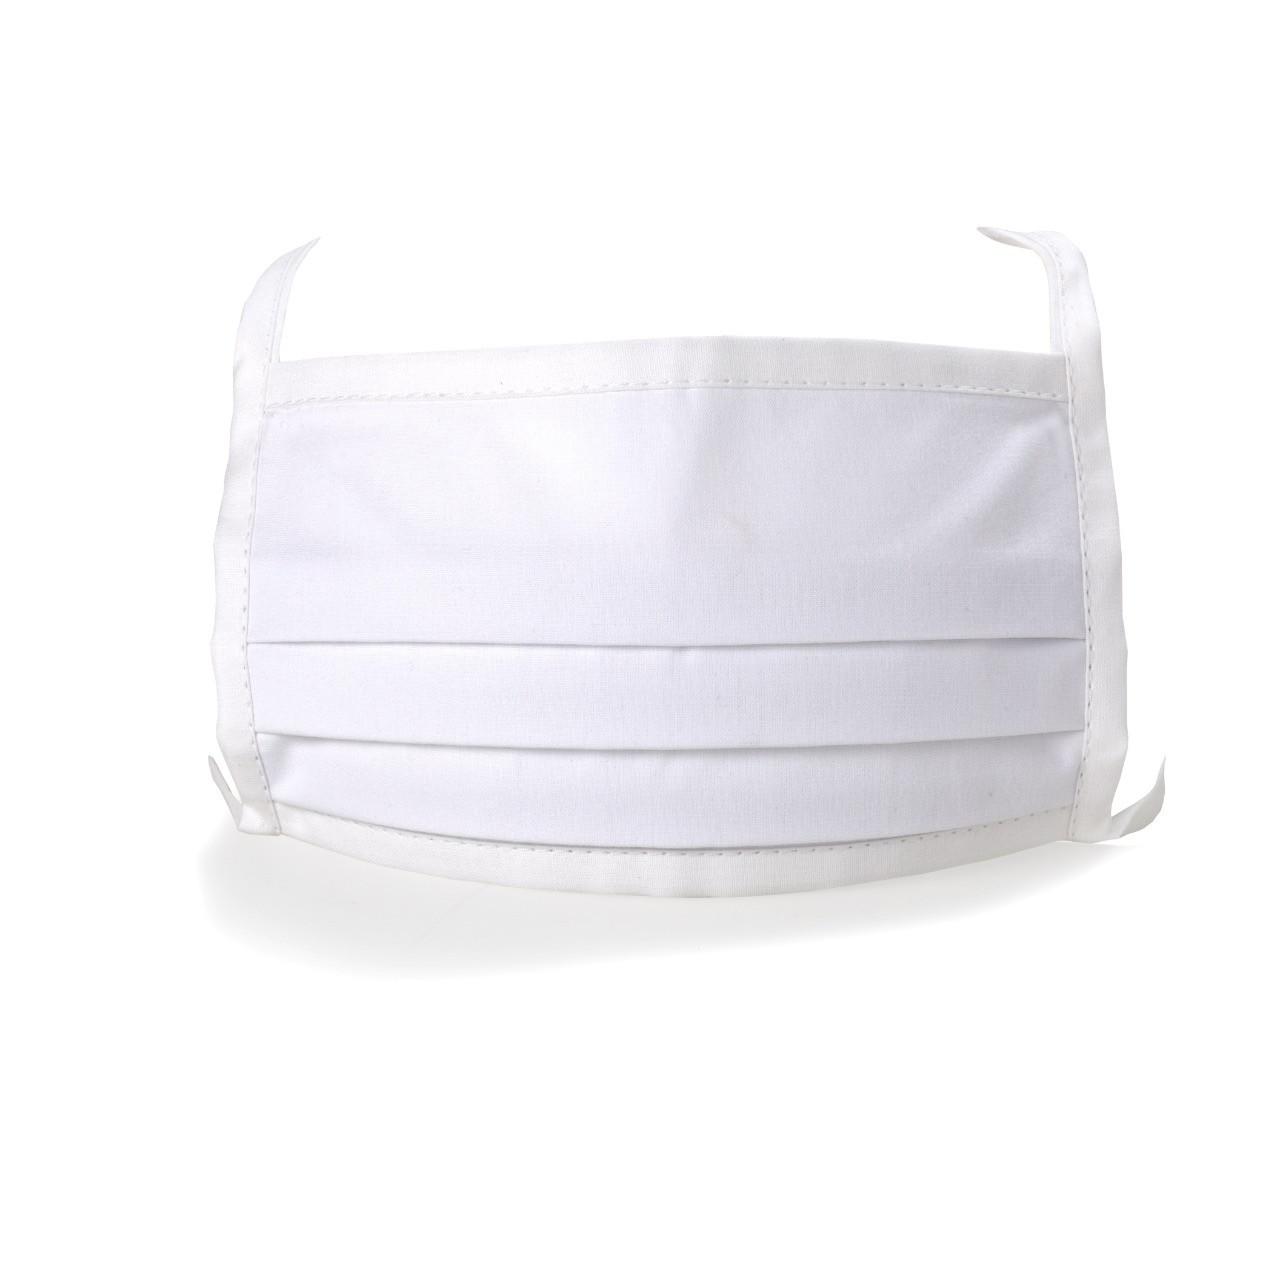 Mascara de Tecido Lavavel Amarracao 4 unidades - Coteminas